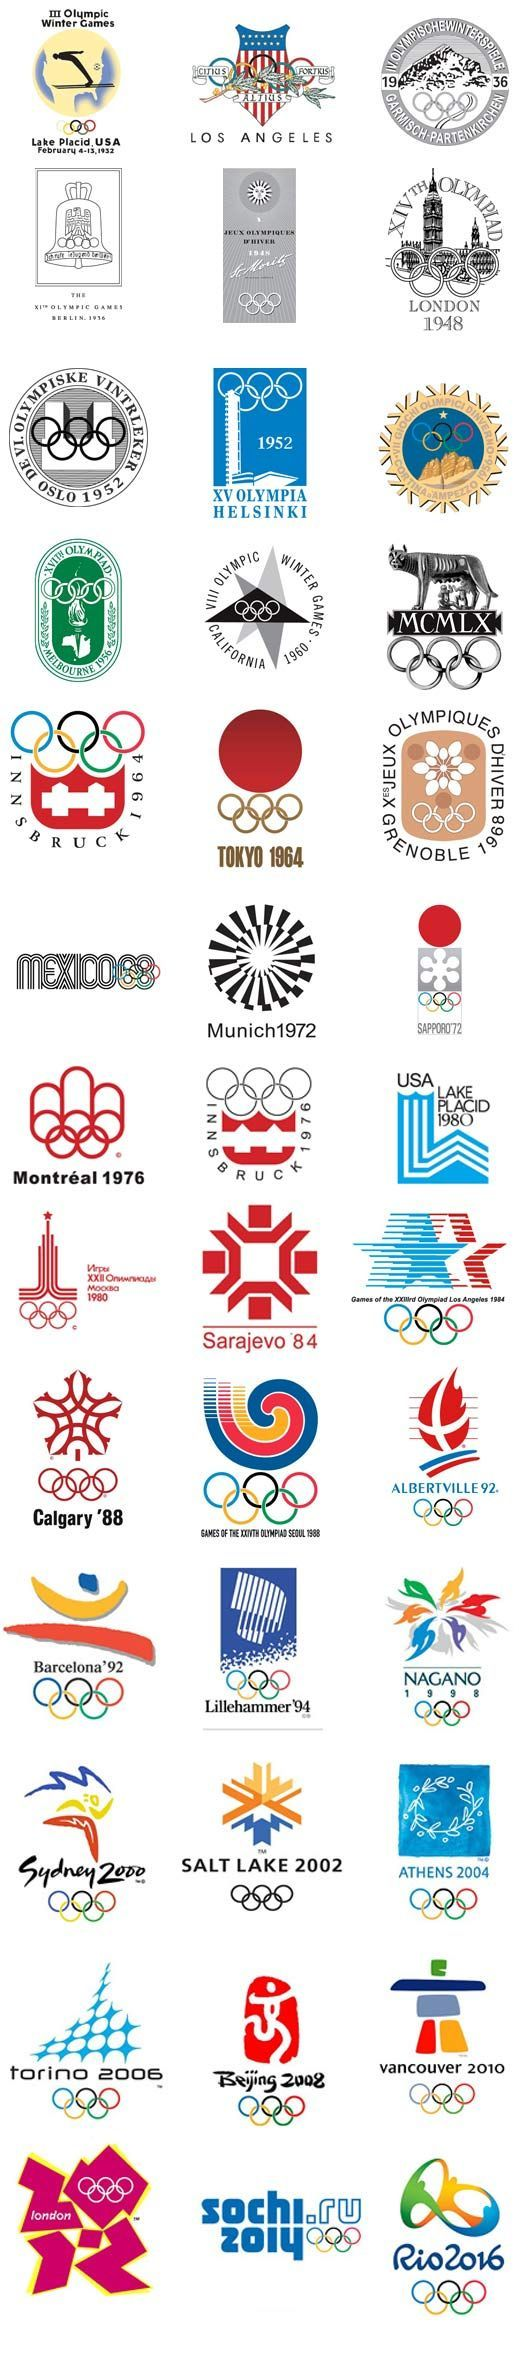 Olympic Logos history 1932 to rio 2016 (except Atlanta '96)